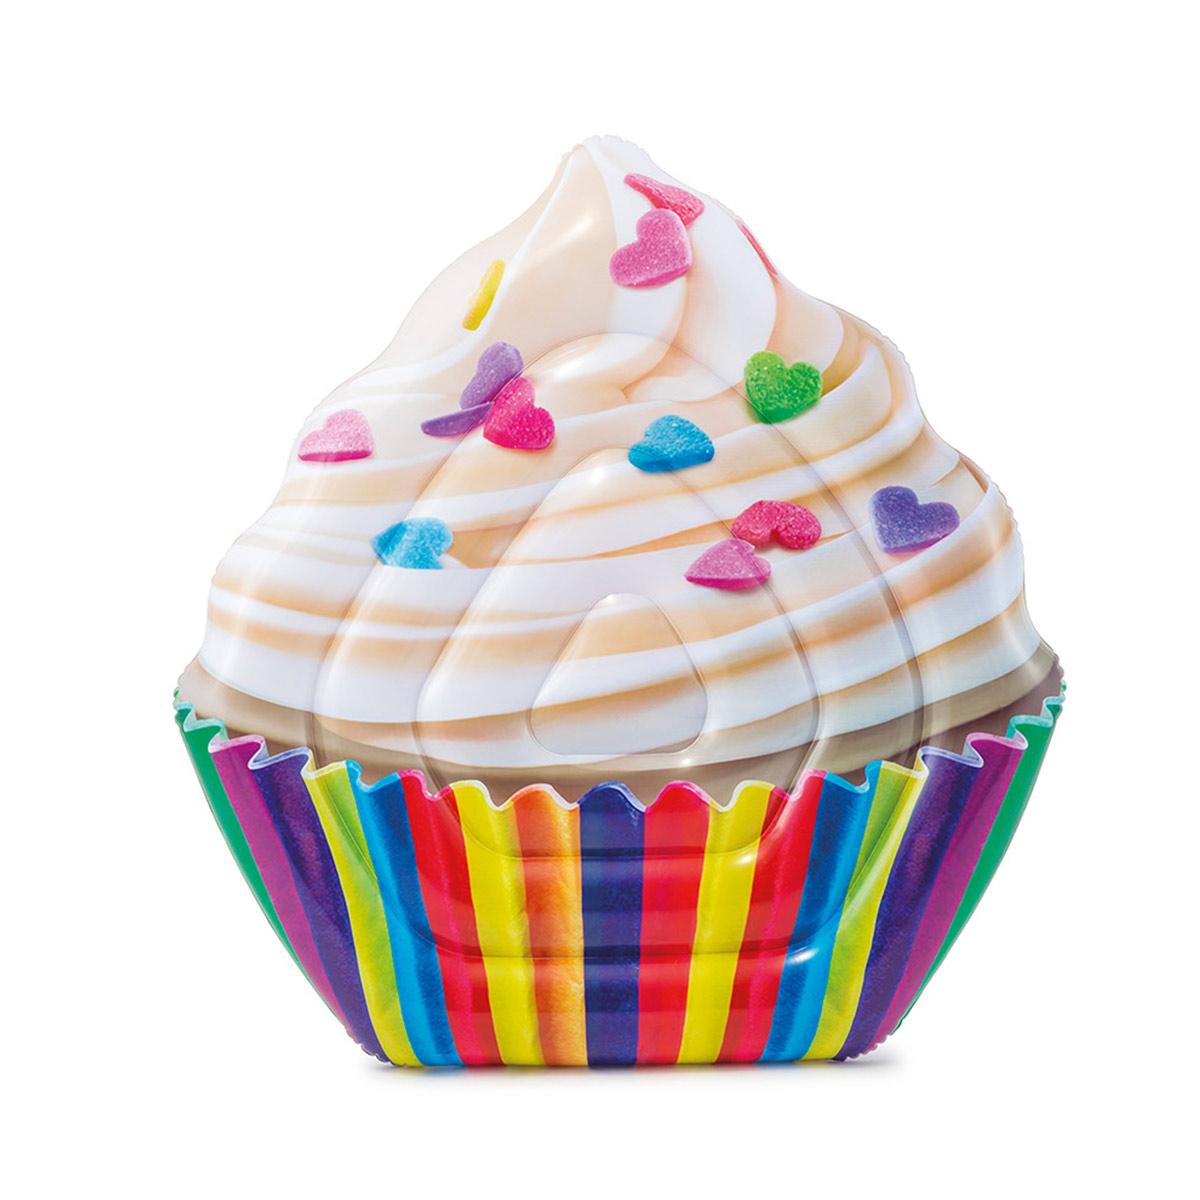 Intex opblaasbare cupcake (142 cm)